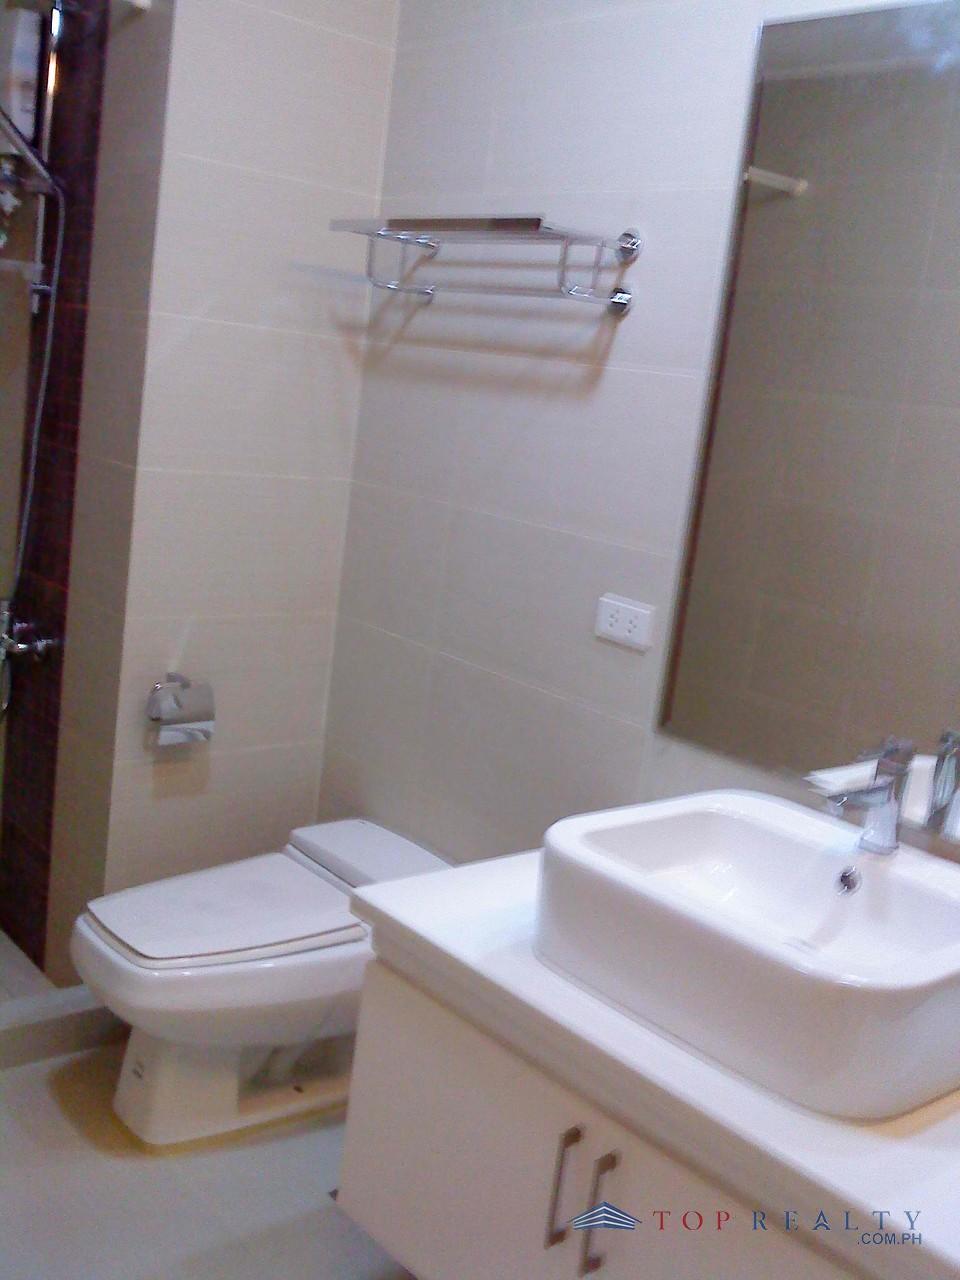 DR88364- Seibu Tower One Bedroom